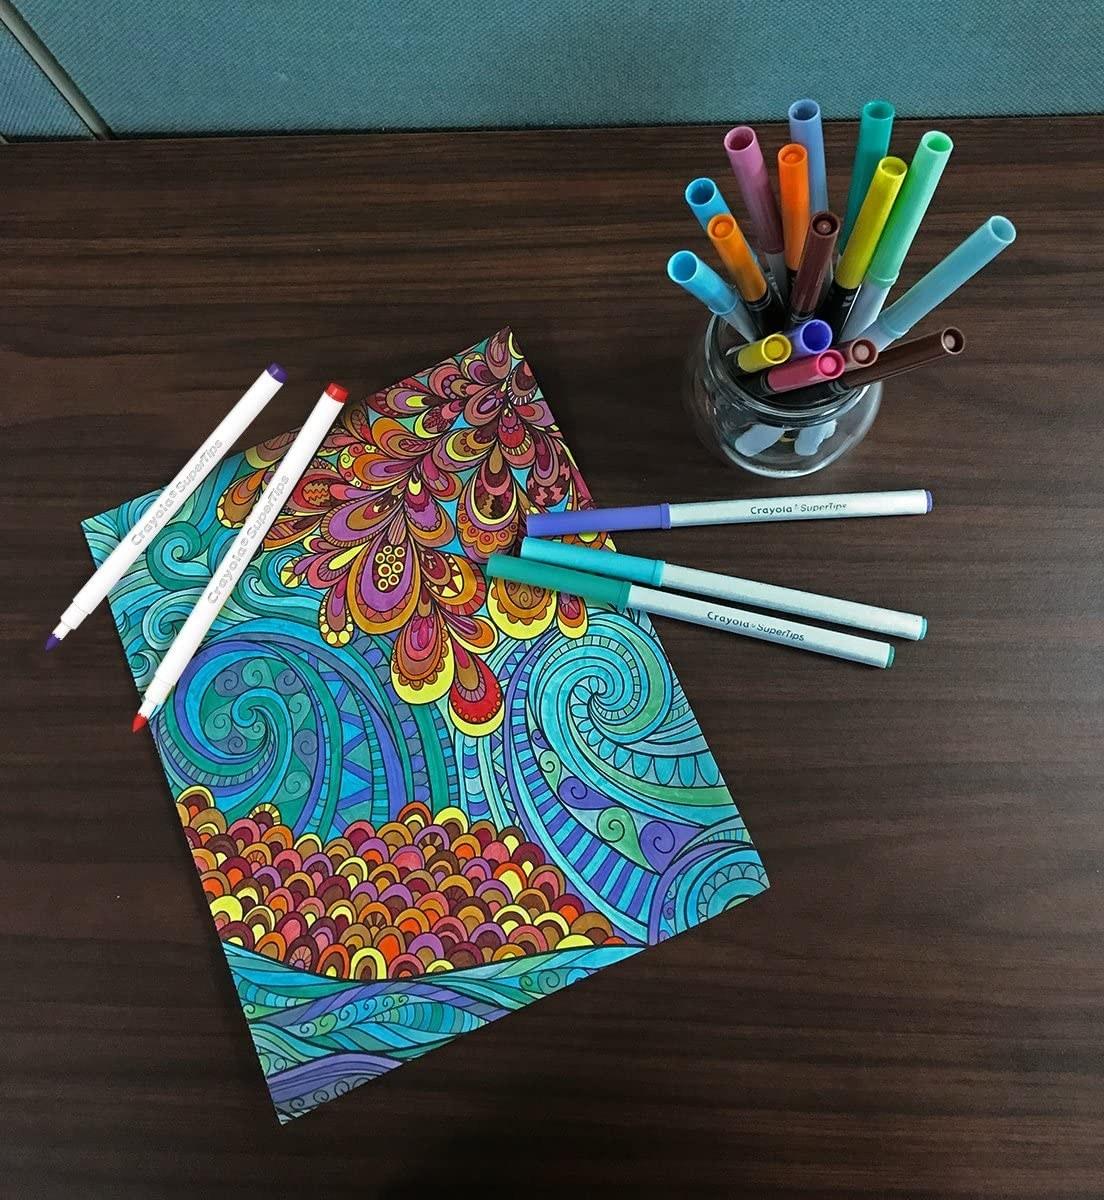 washable felt tip pens